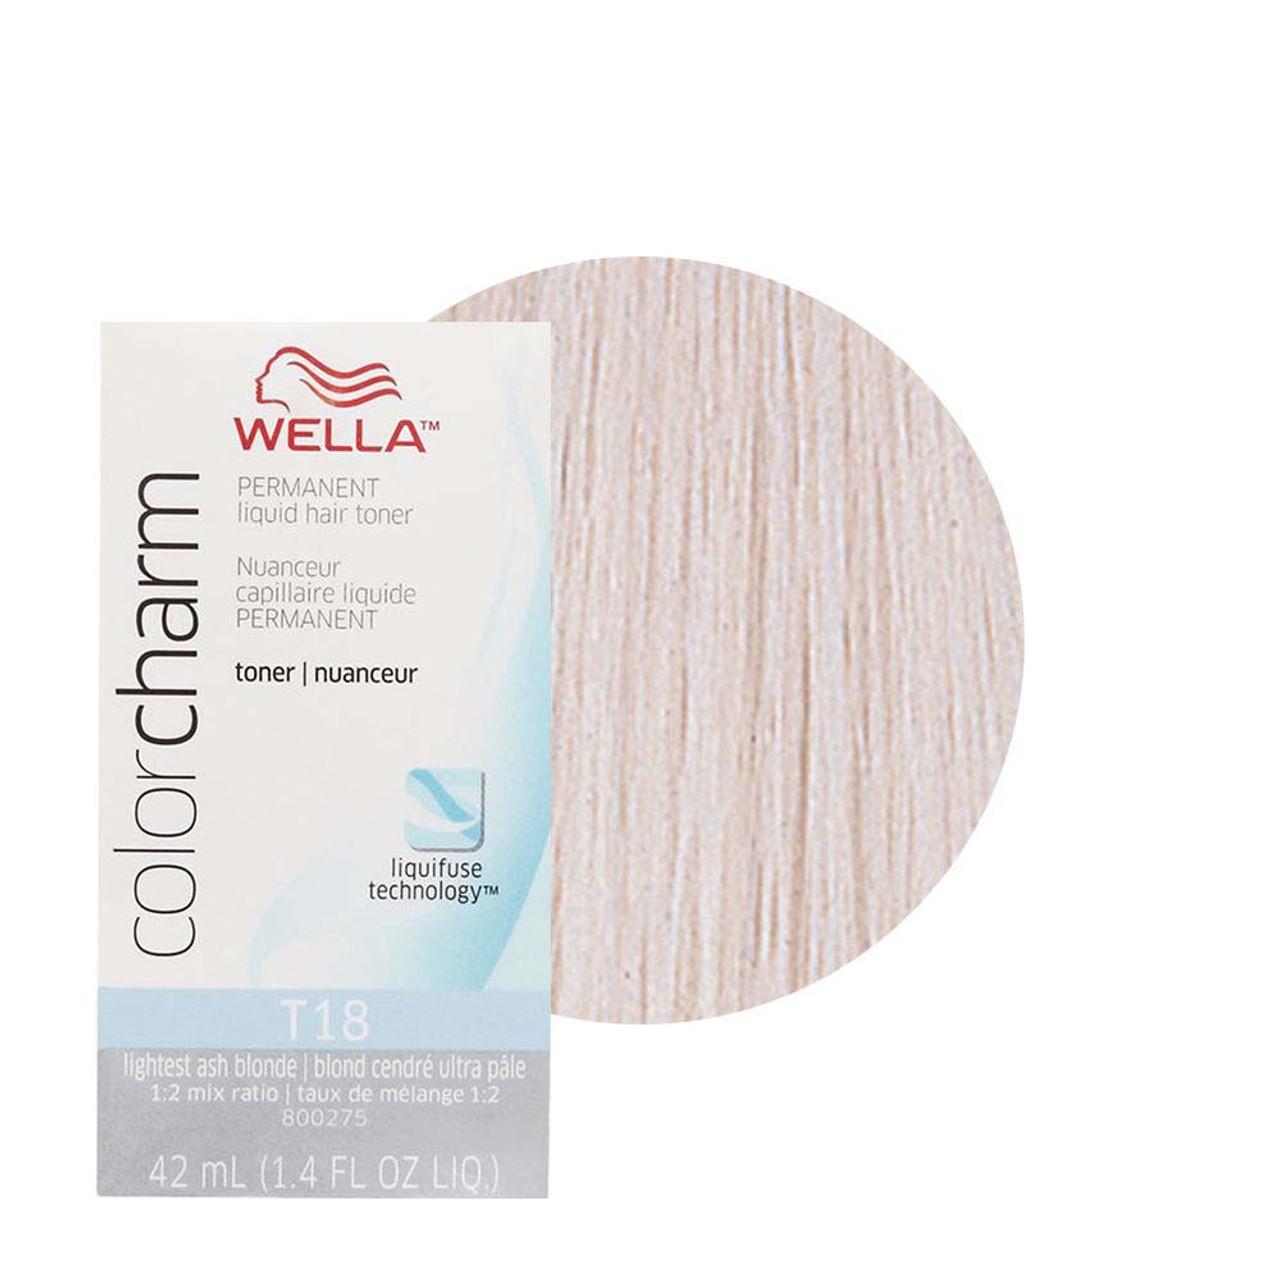 Wella T18 Color Charm 1.4 oz